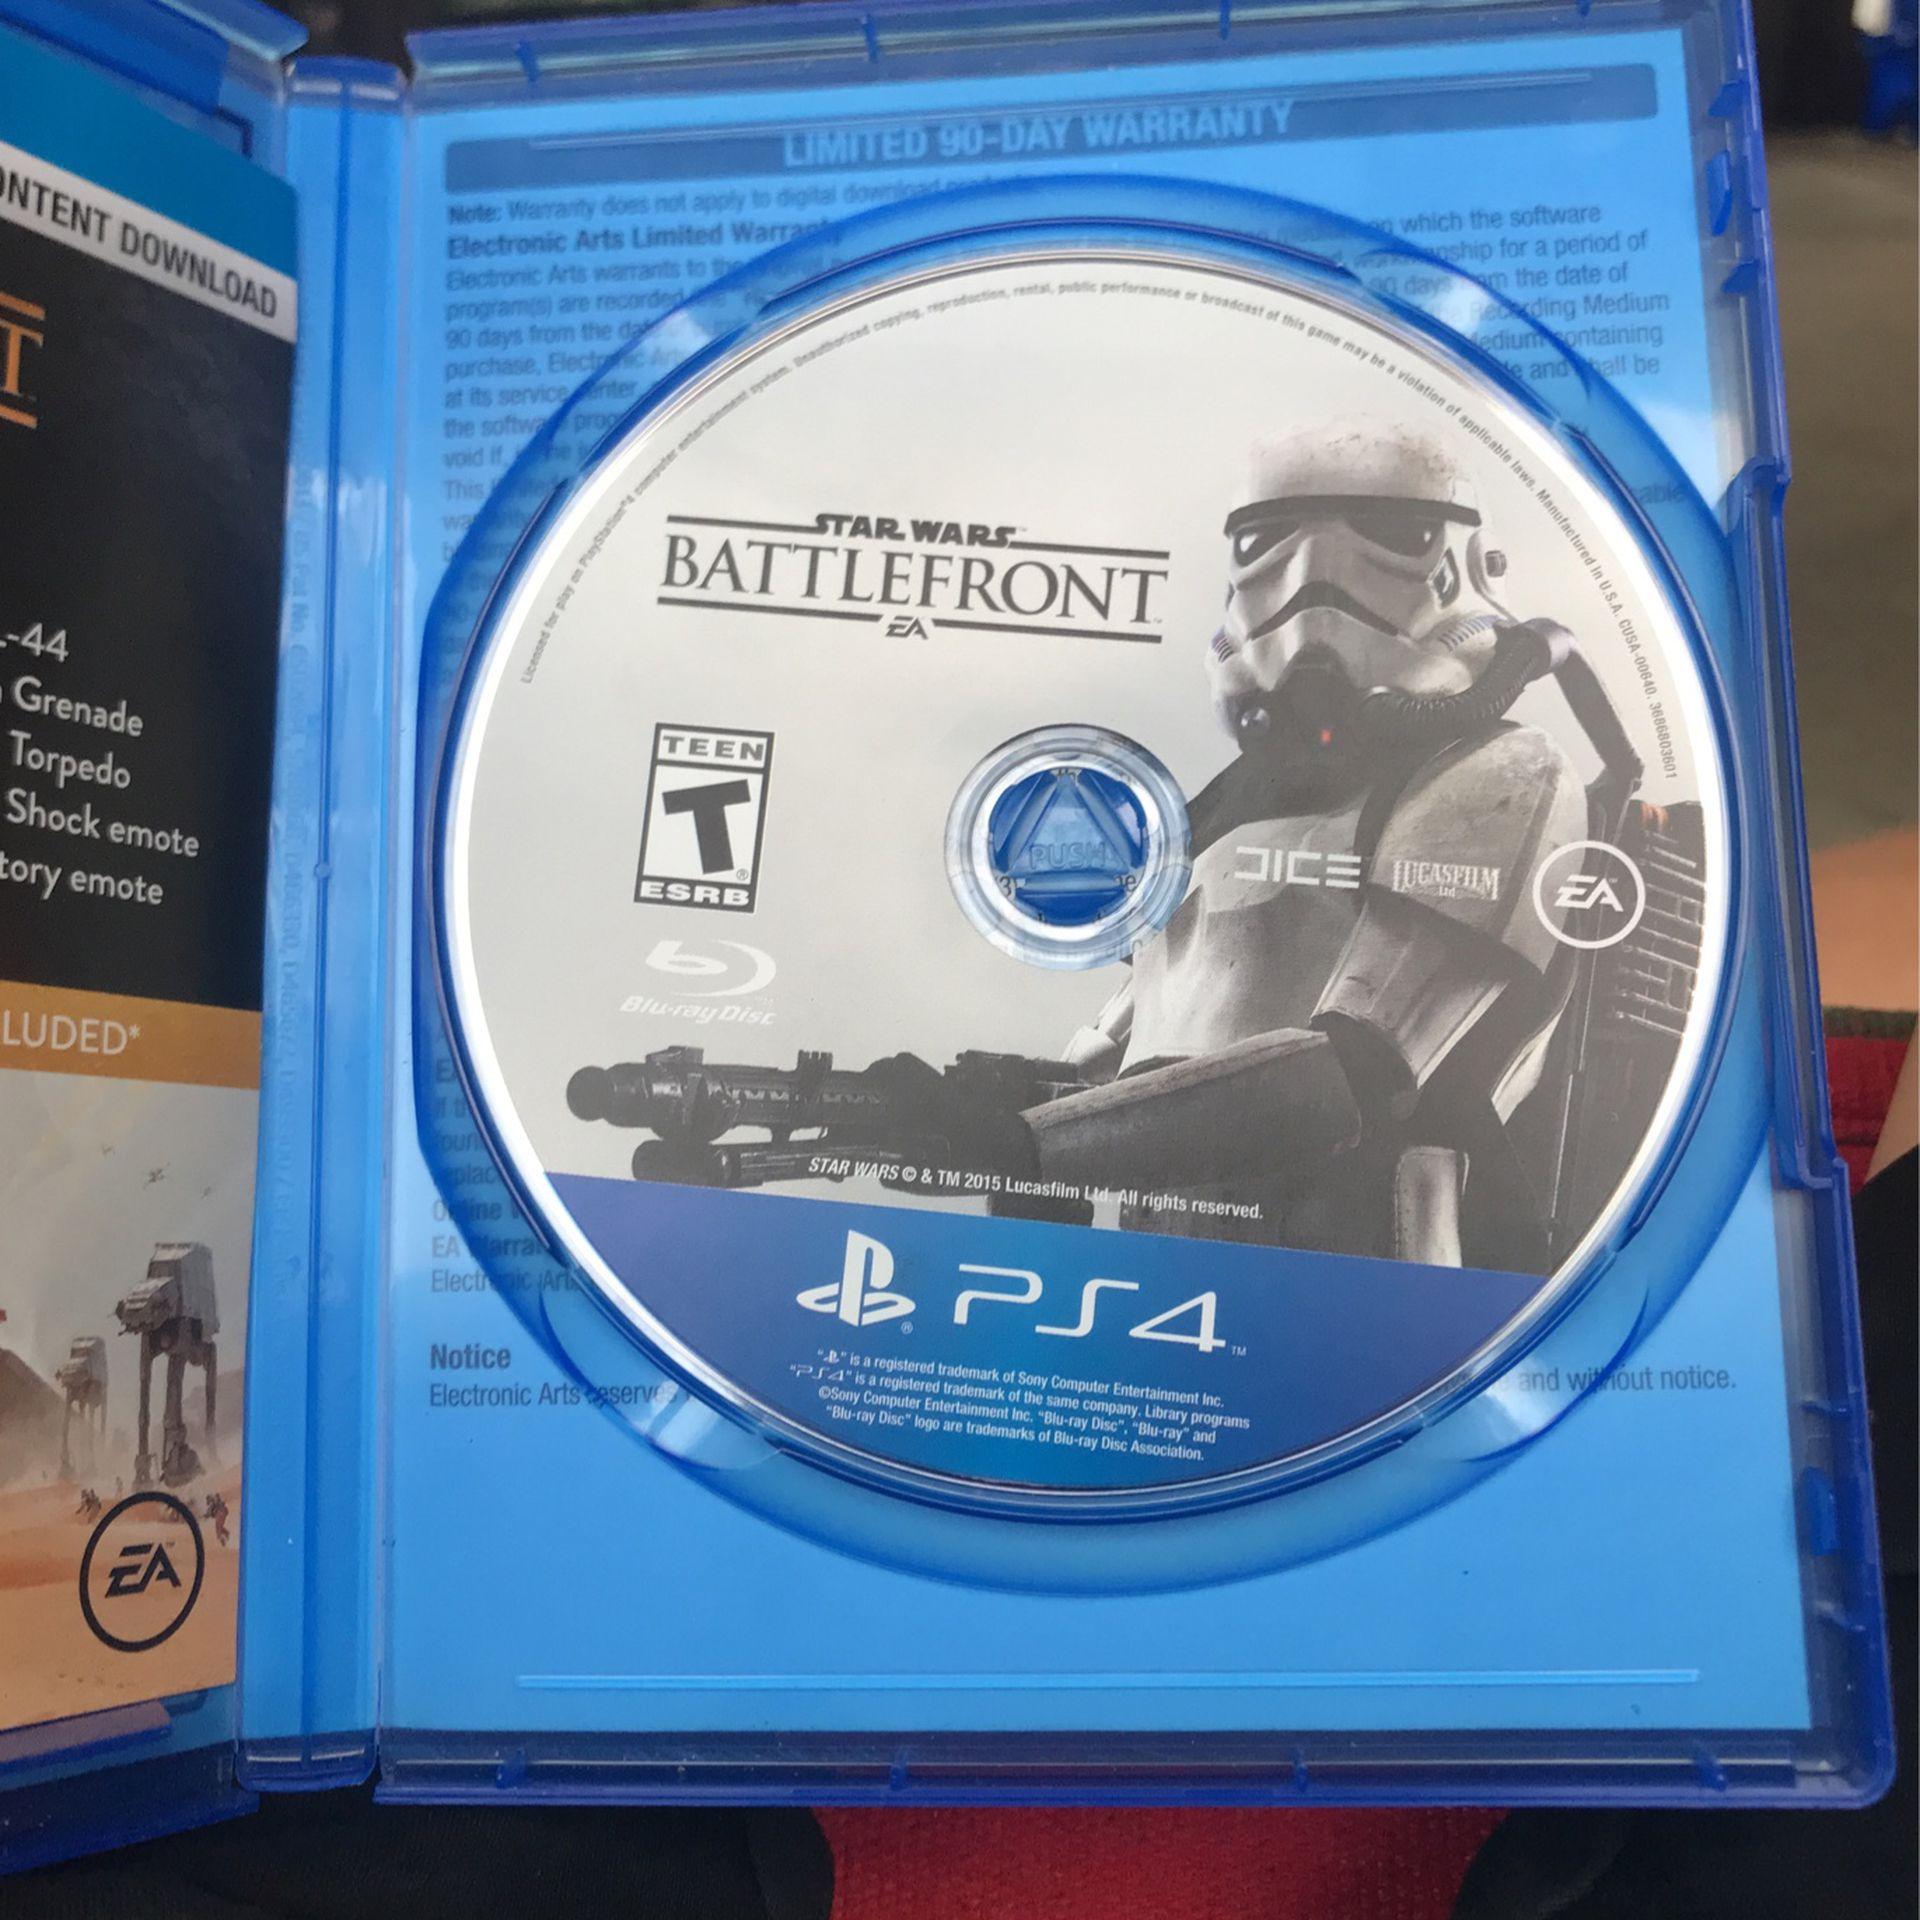 5 Pack Ps4 Games- Battlefront Deluxe Edition, Battlefront 2, Madden 18, Monster Hunter World, Cars 3 Driven 2 Win